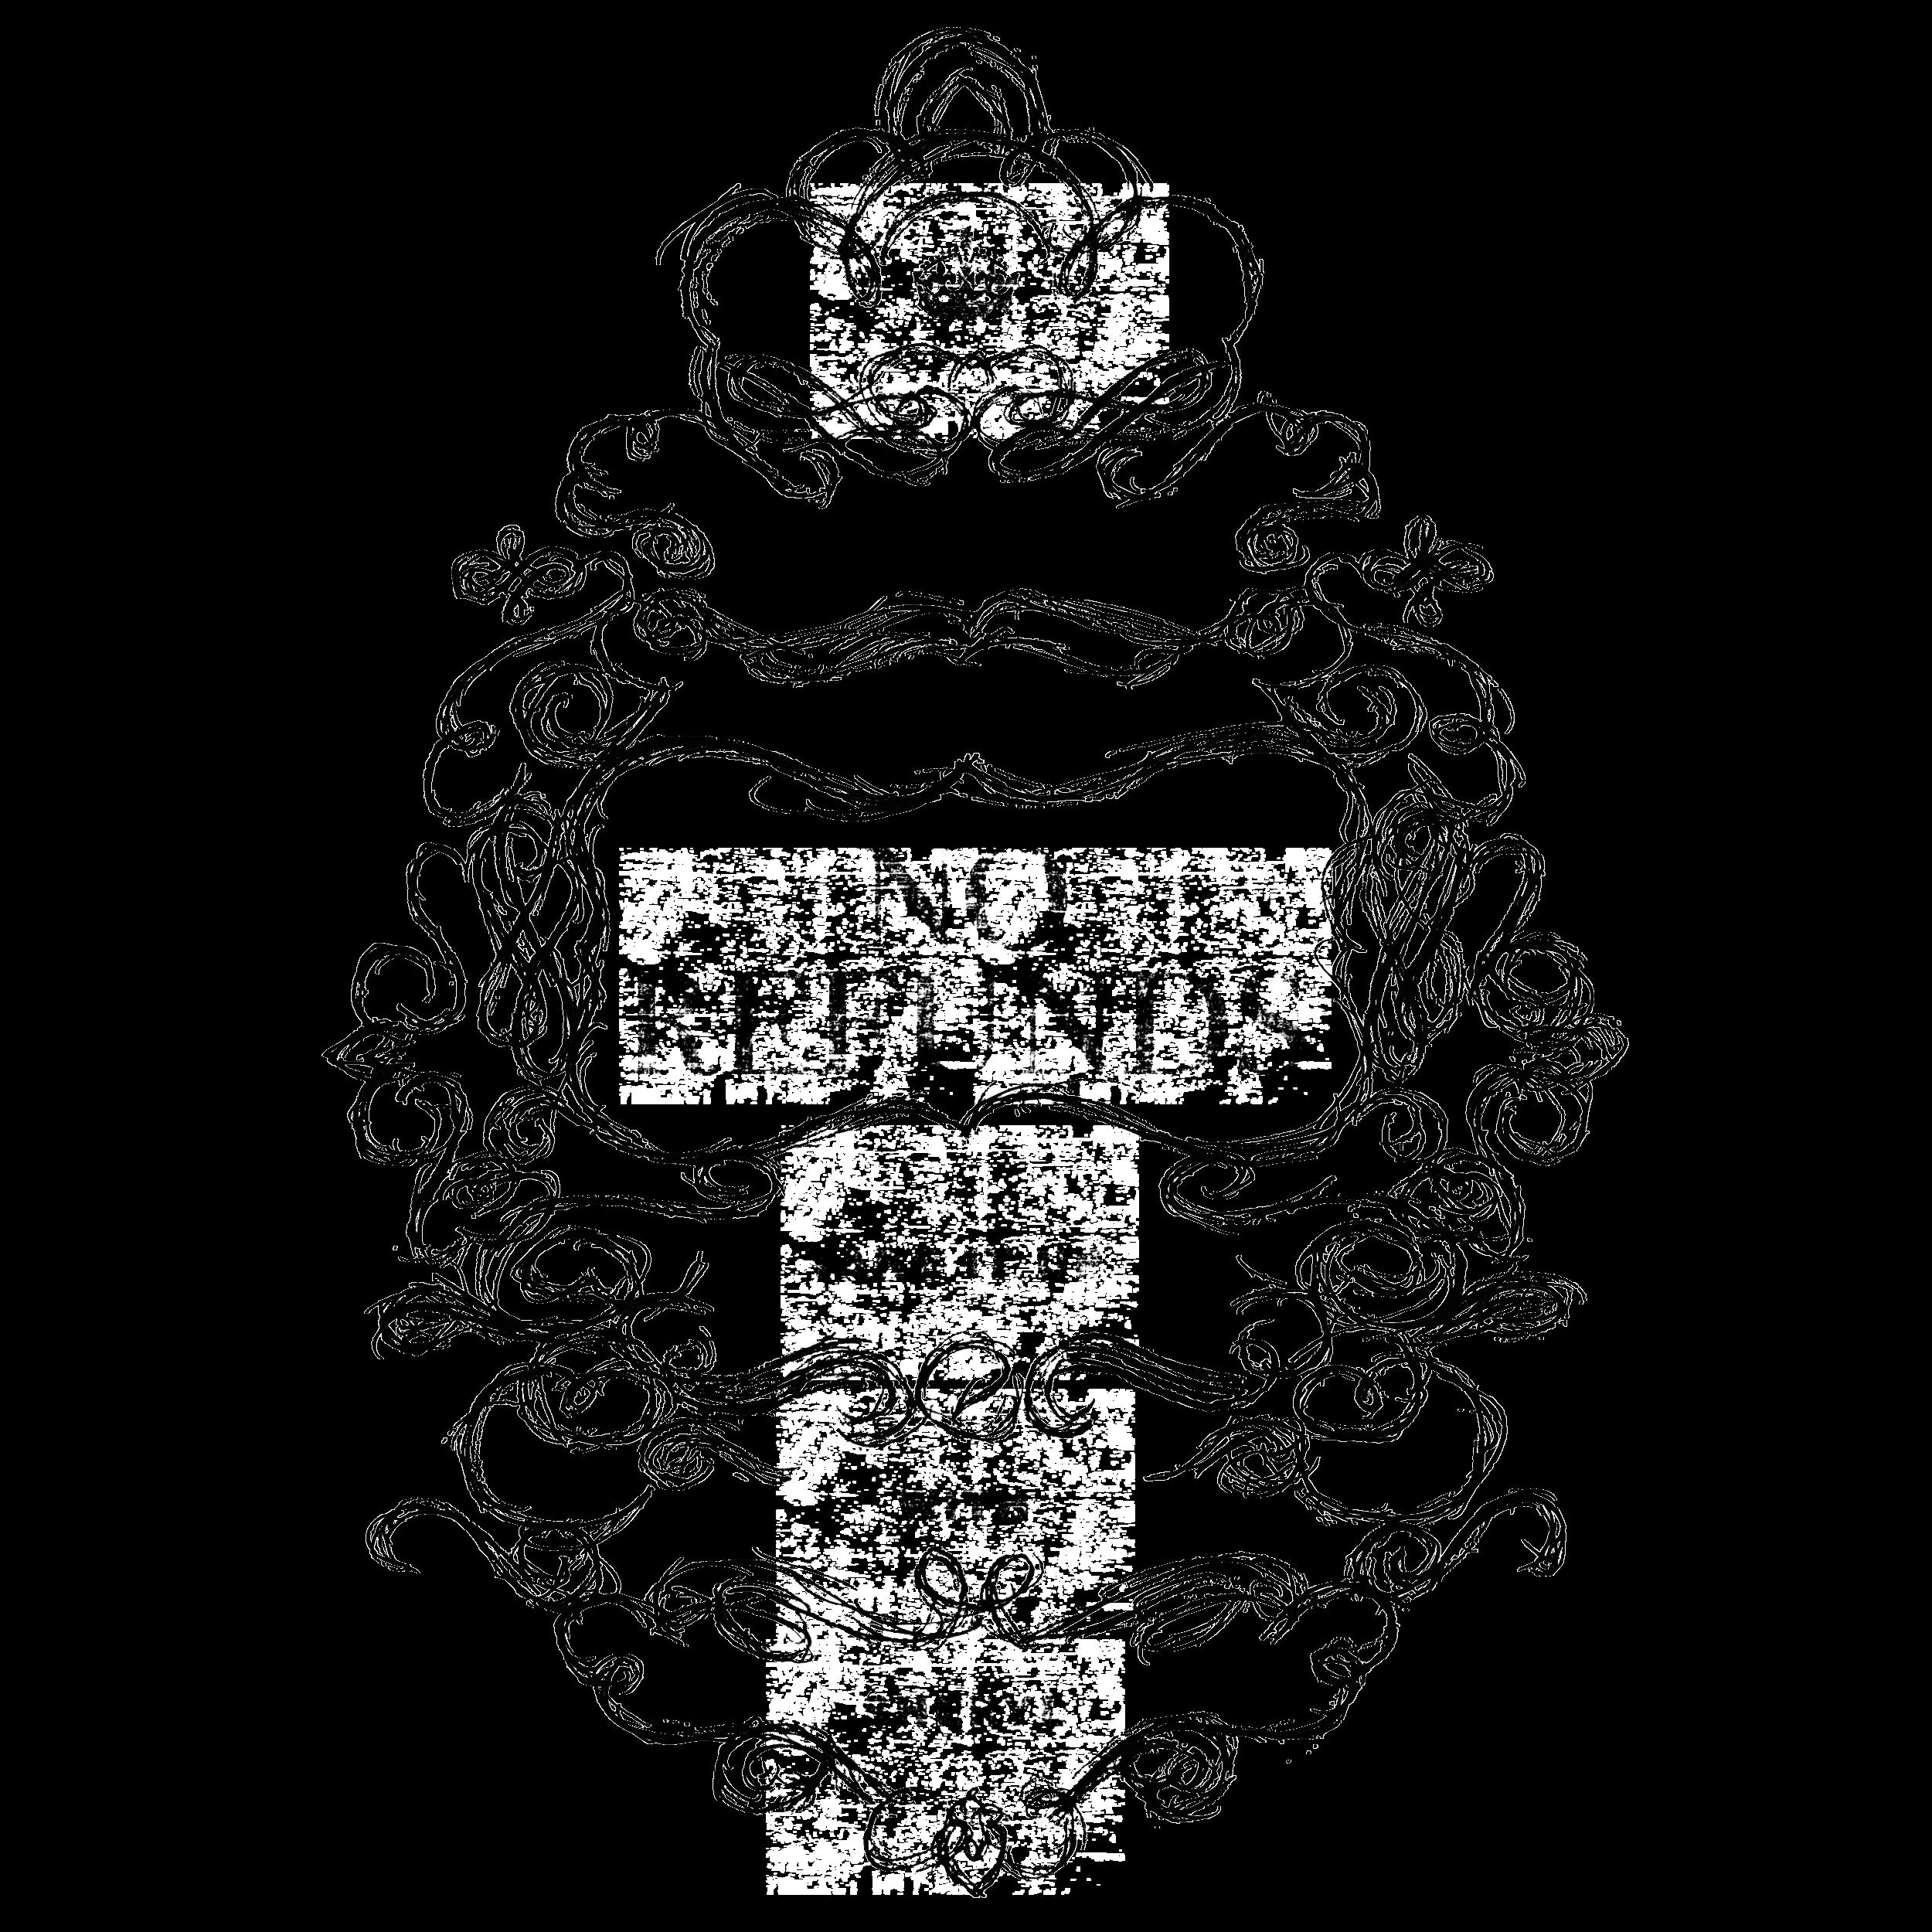 No Refunds T-shirts_Artboard 11.png